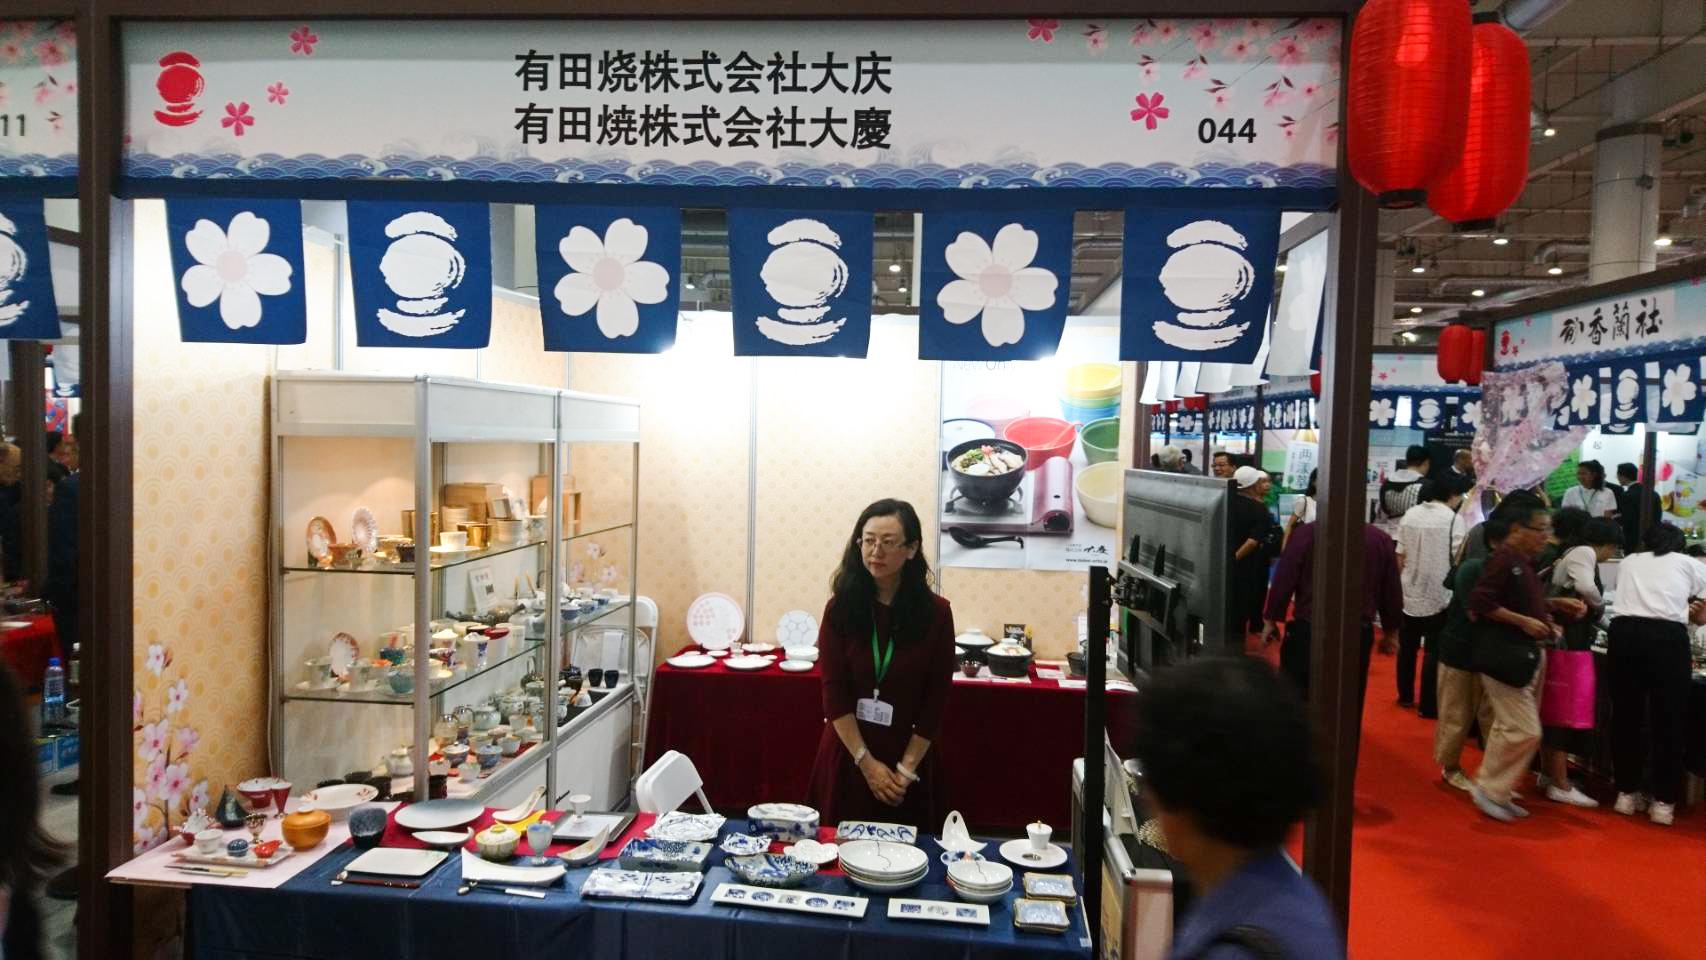 大連日本商品展覧会に出展